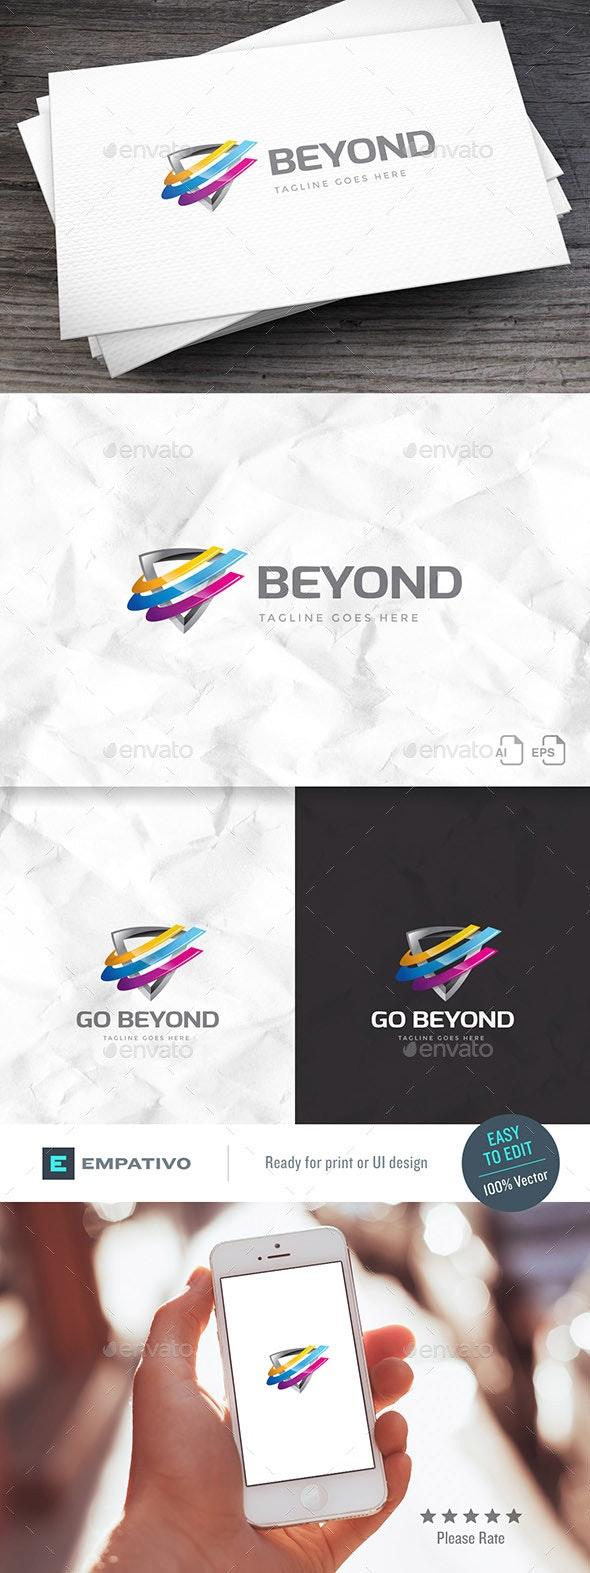 Go Beyond Logo Template